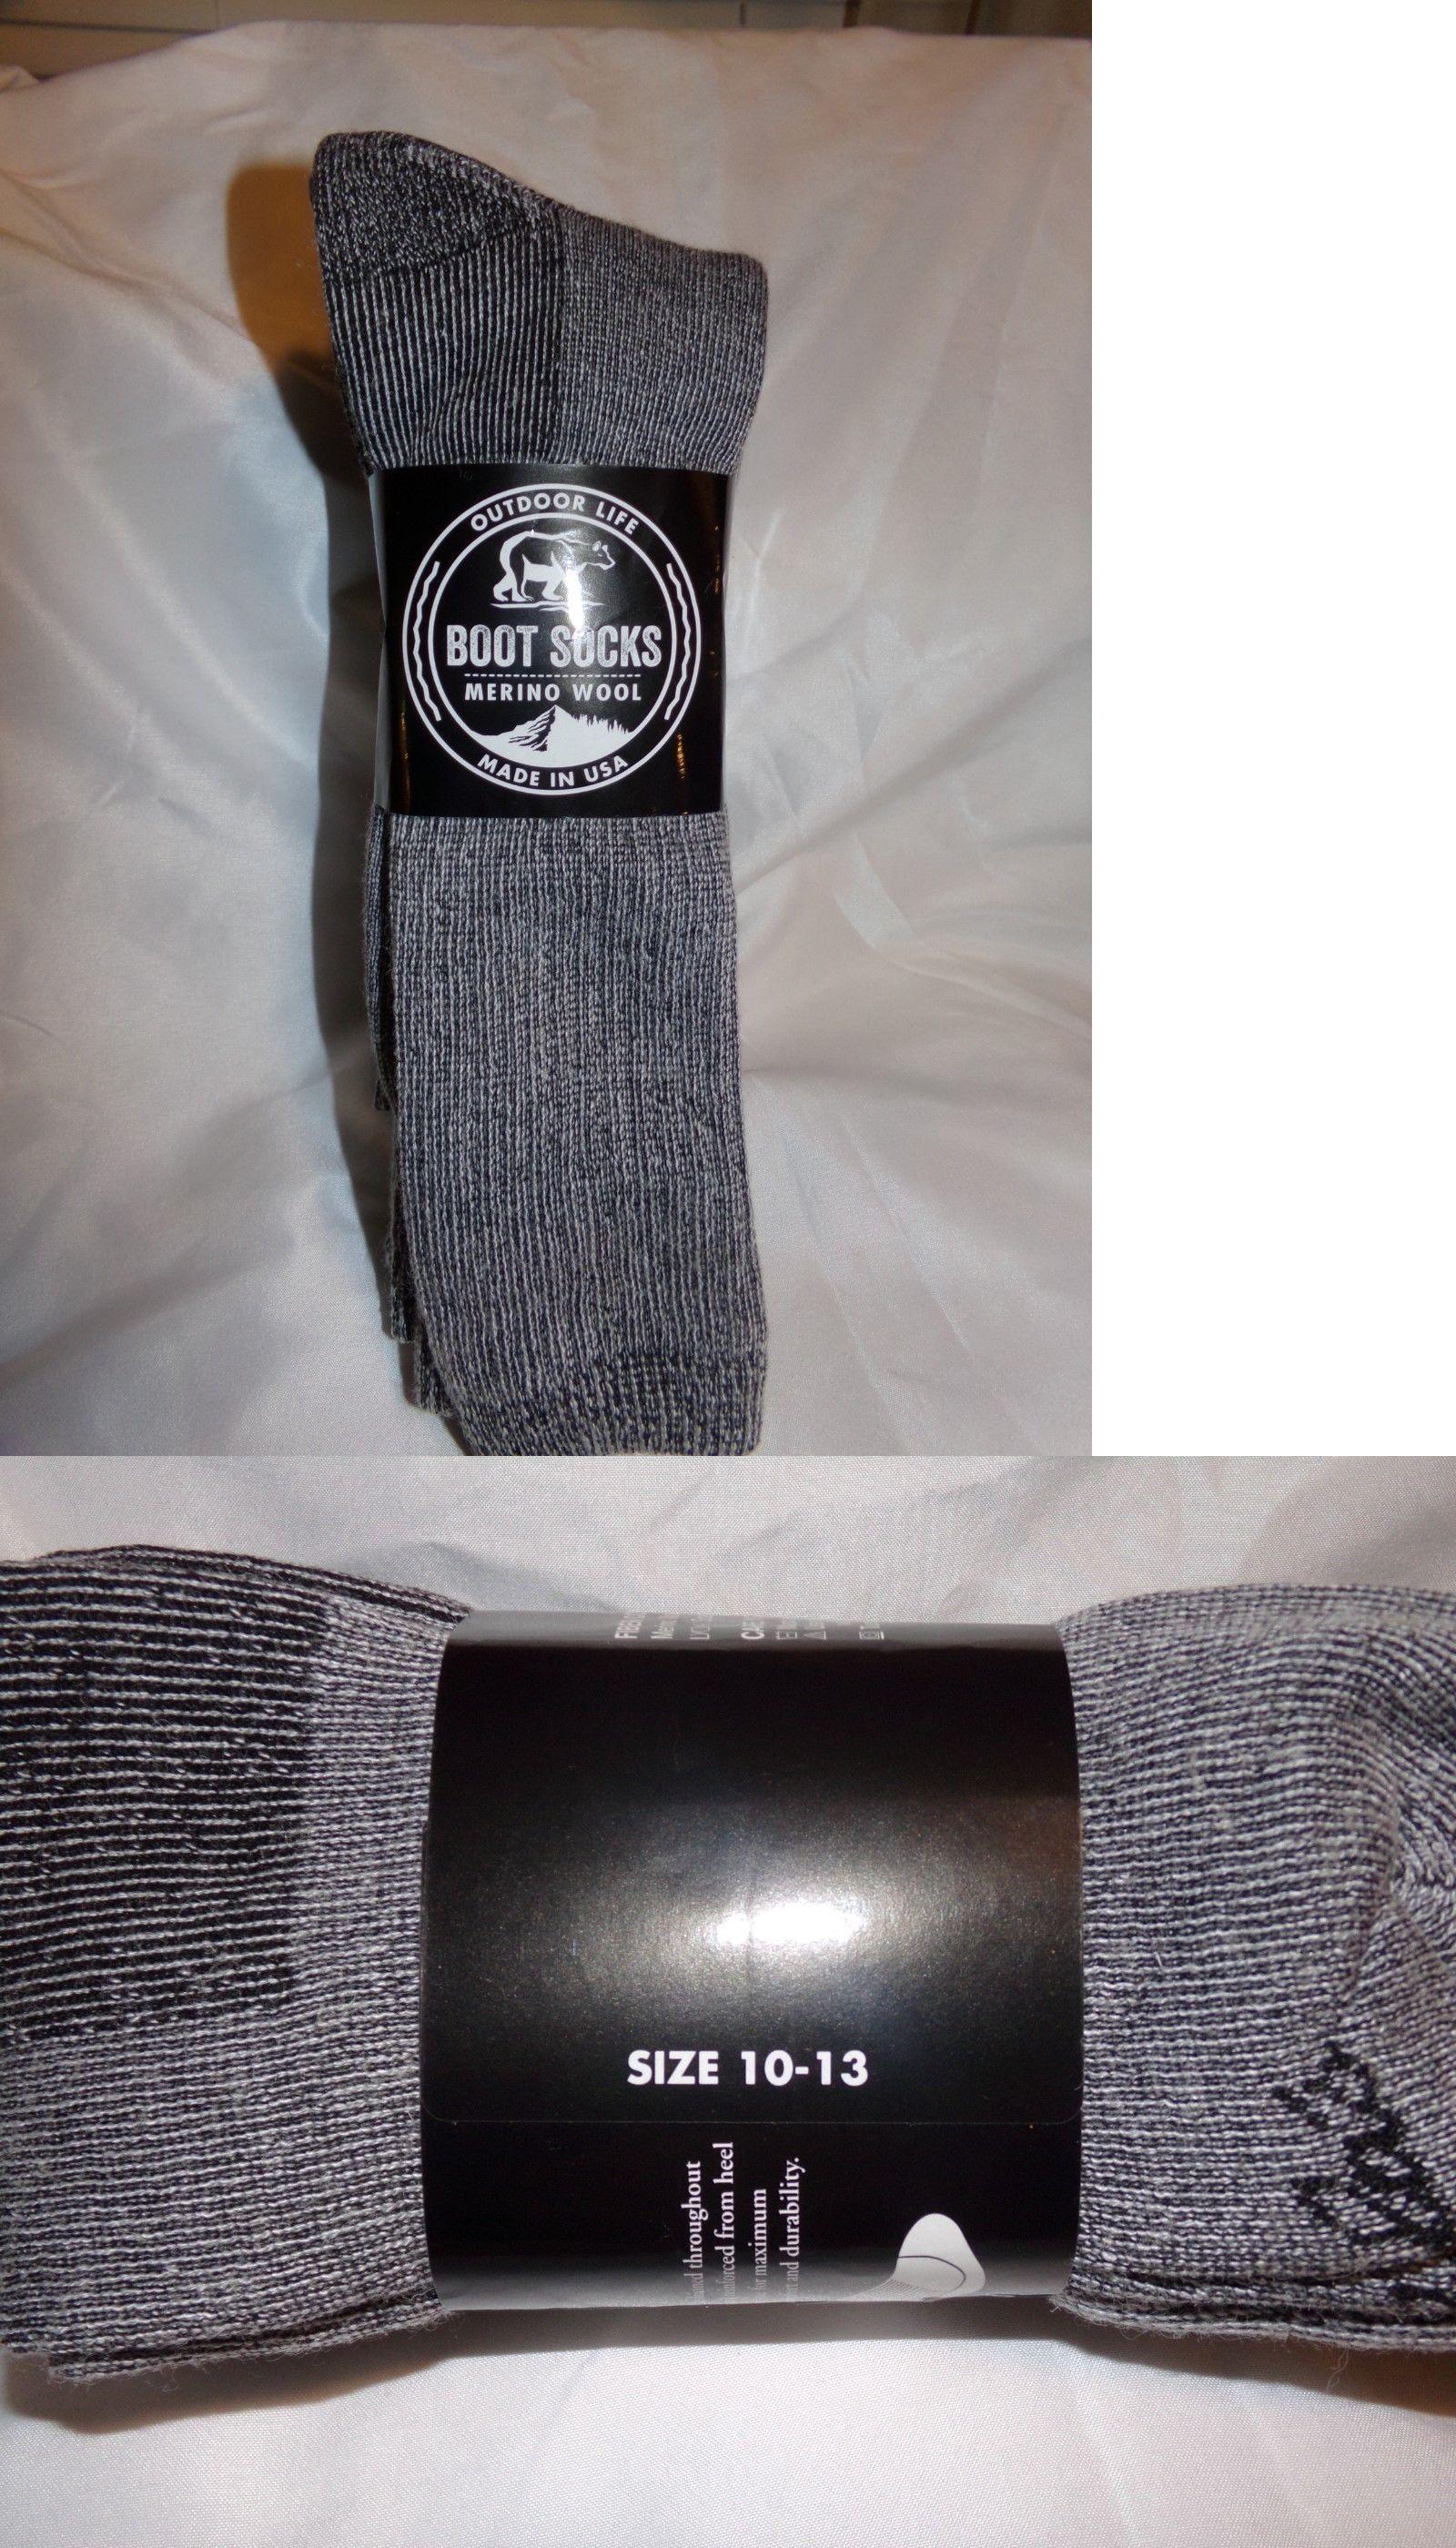 e43e3cf8b6406 Socks 166695: 3 Pair Mens Gray Outdoor Life 48% Merino Wool Socks Size 10-13,  100% Usa Made -> BUY IT NOW ONLY: $11.95 on #eBay #socks #outdoor #merino